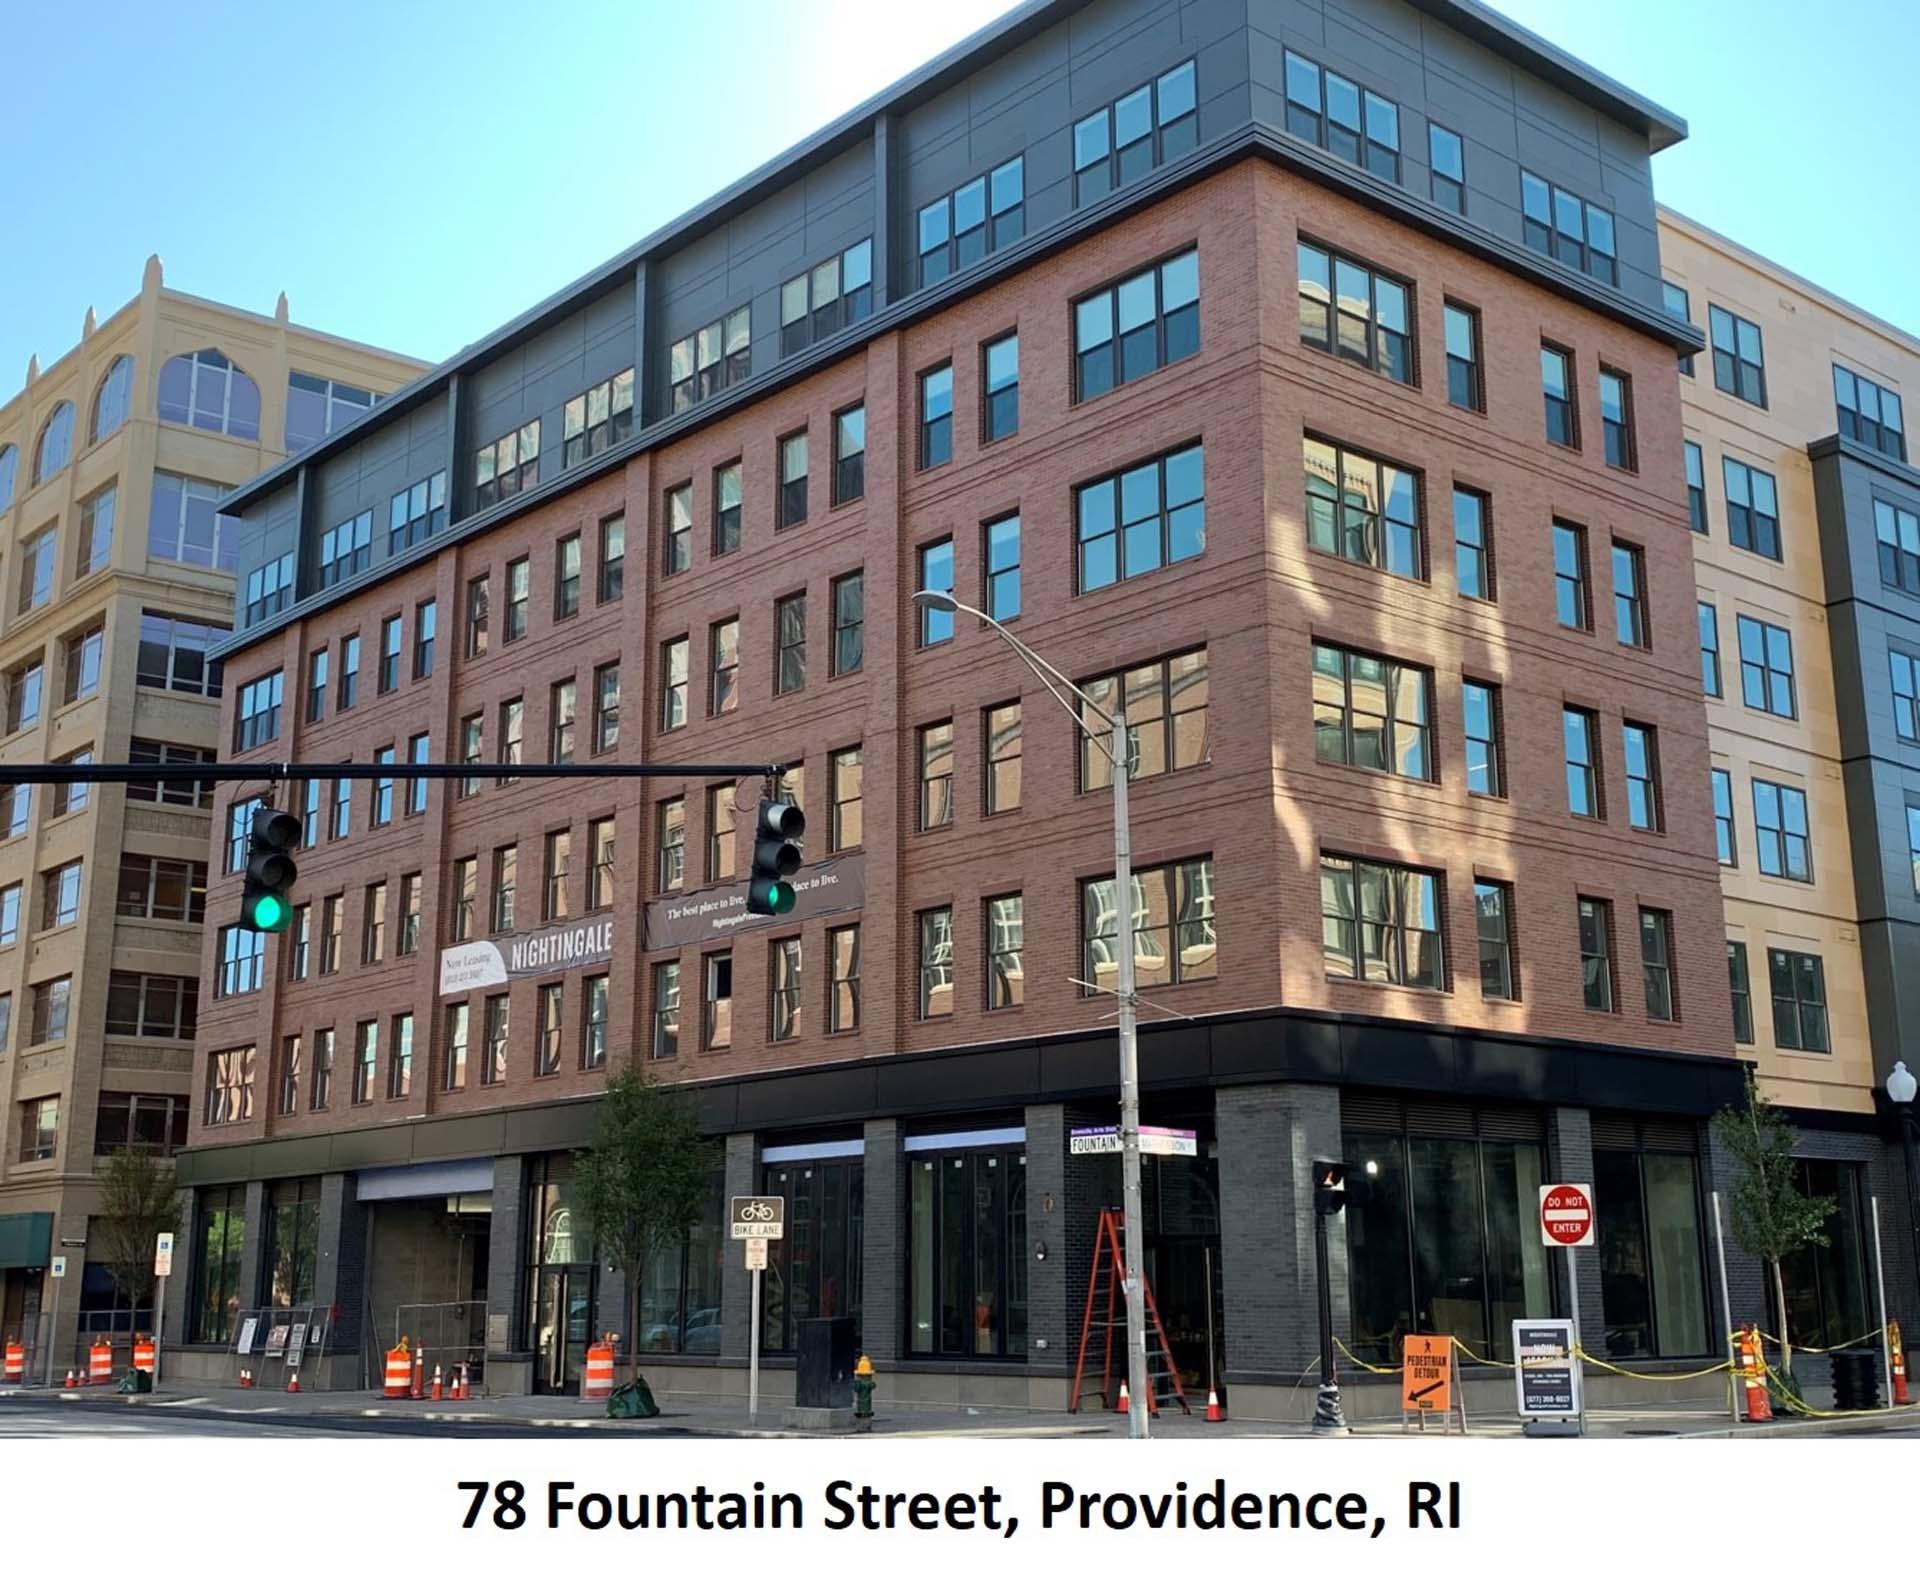 78 Fountain St. Providence RI